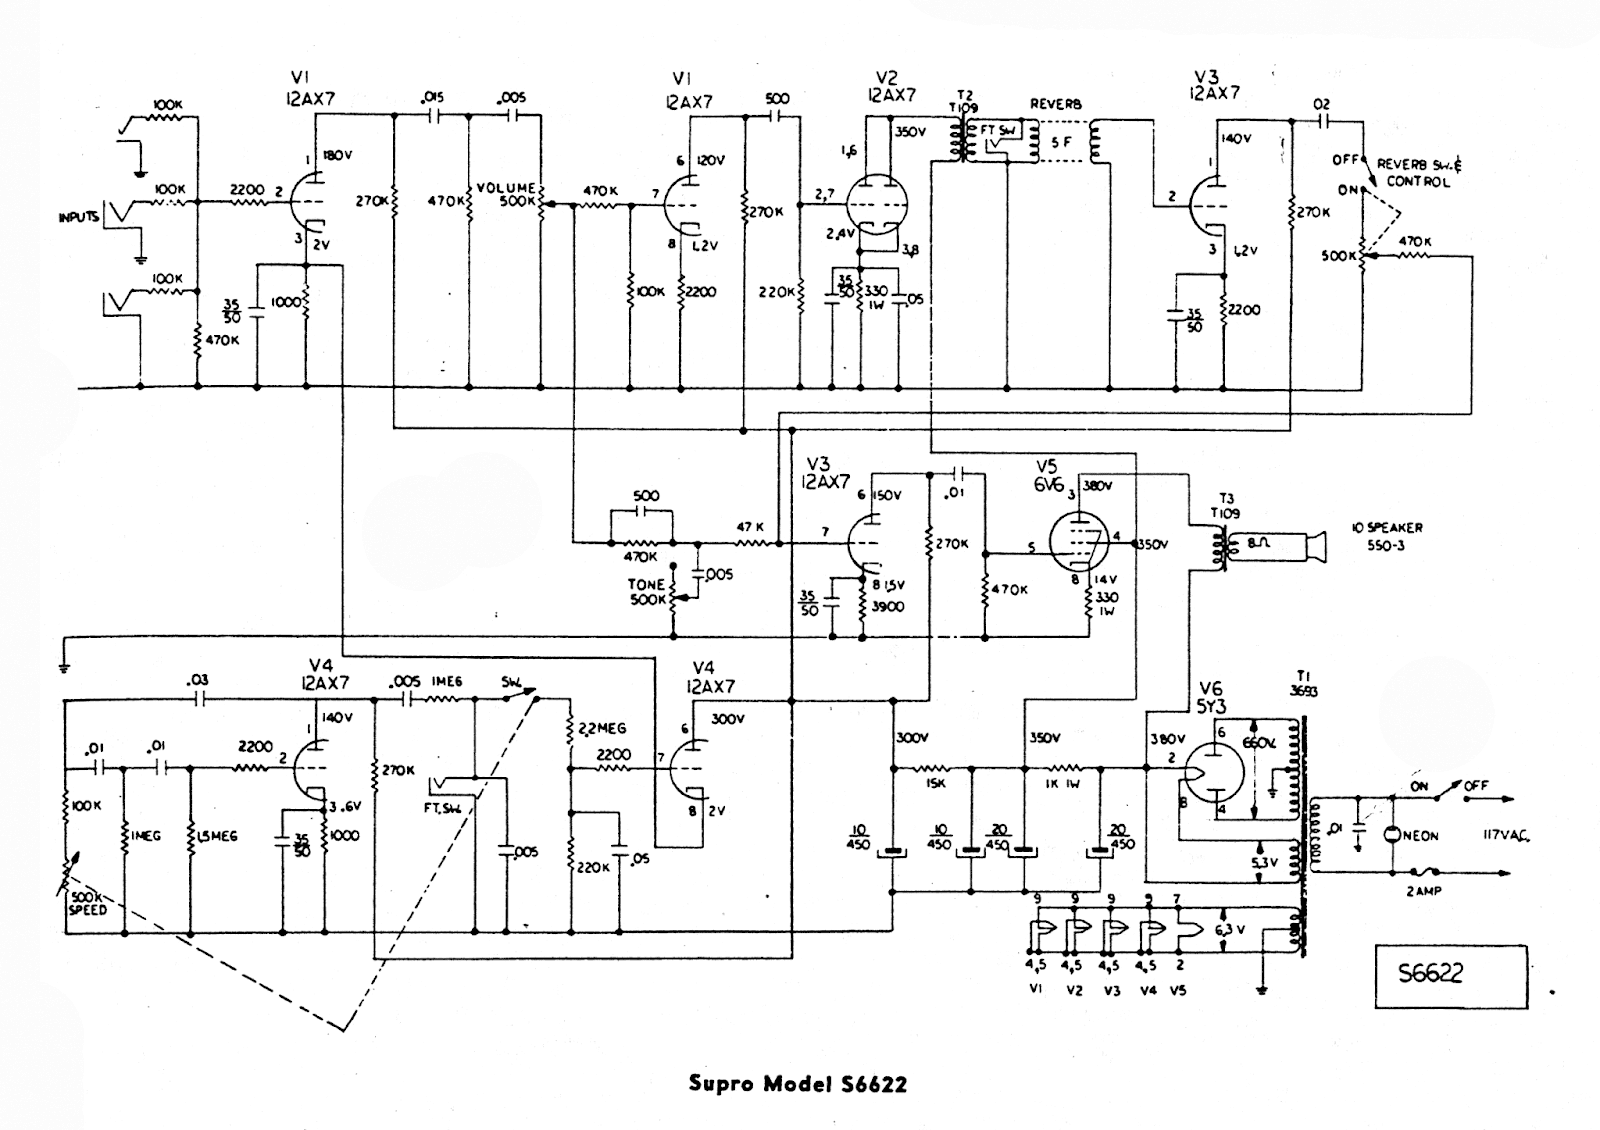 hight resolution of circuit national supro valconational supro valco schematic 1966 custom kraft 900 aka supro